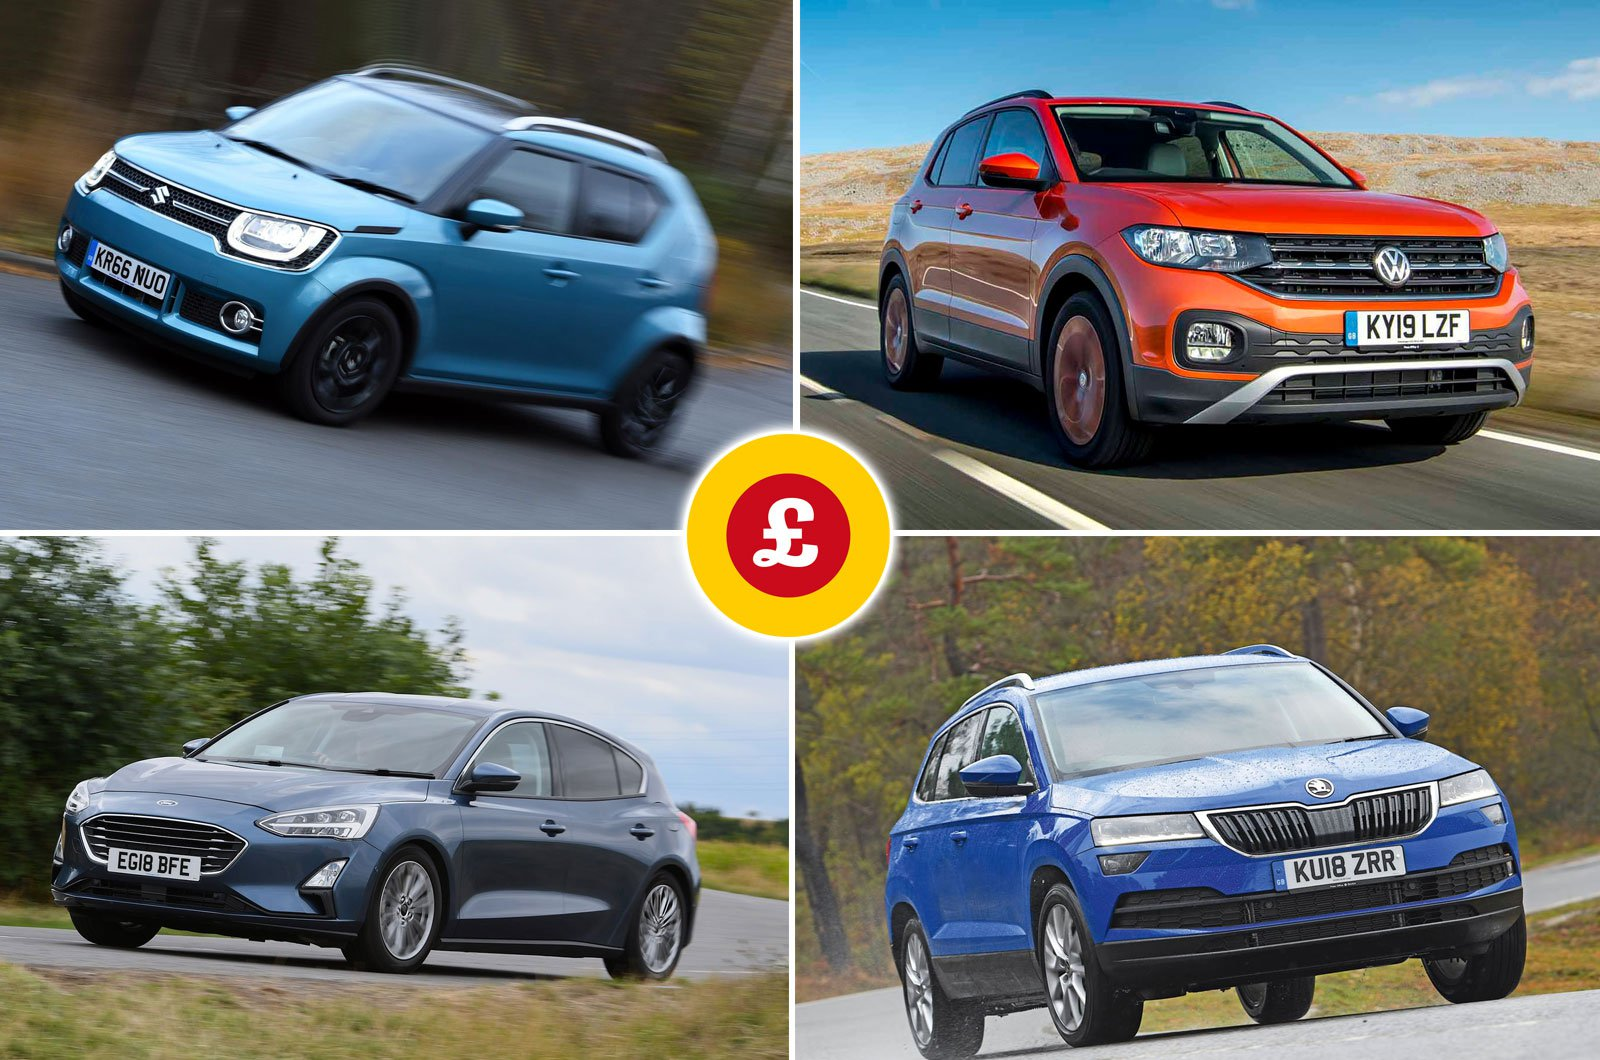 Suzuki Ignis, Volkswagen T-Cross, Ford Focus, Skoda Karoq